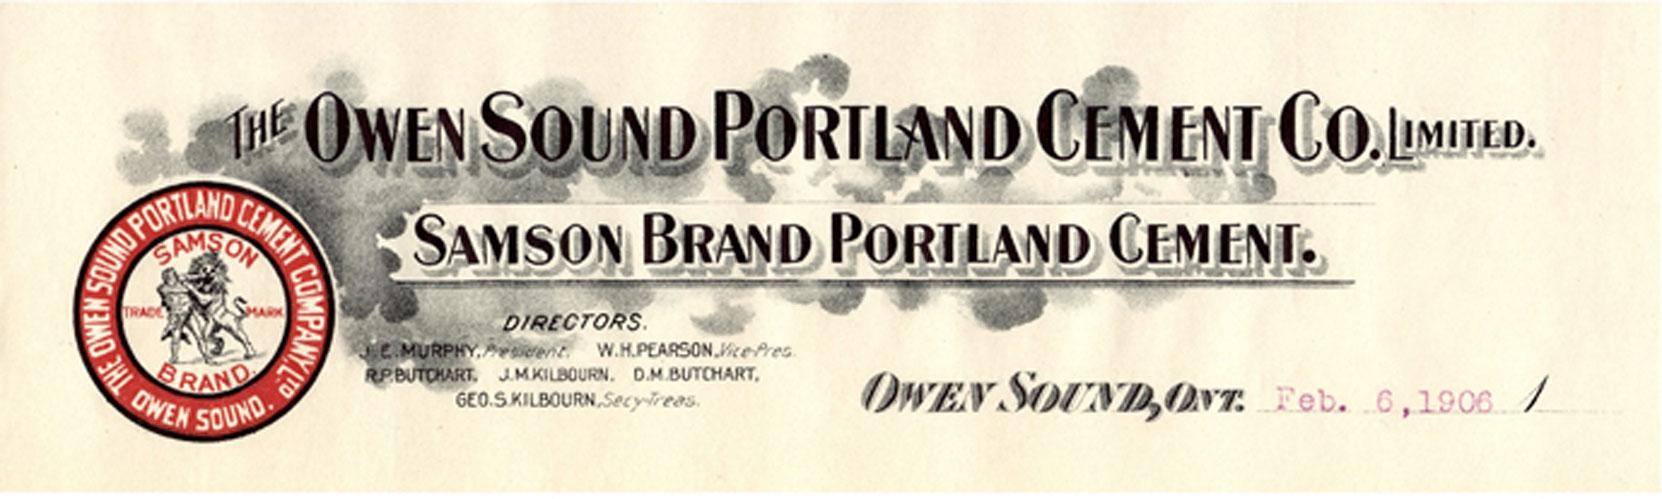 Owen Sound Portland Cement Company letterhead, 1906 Note the names of the corporate officers listed: James Edward Murphy, President; William H. Pearson, Vice-President; George S. Kilbourn, Secretary-Treasurer; Directors: Robert Pim Butchart, John M. Kilbourn, David Martin Butchart (Author's collection)